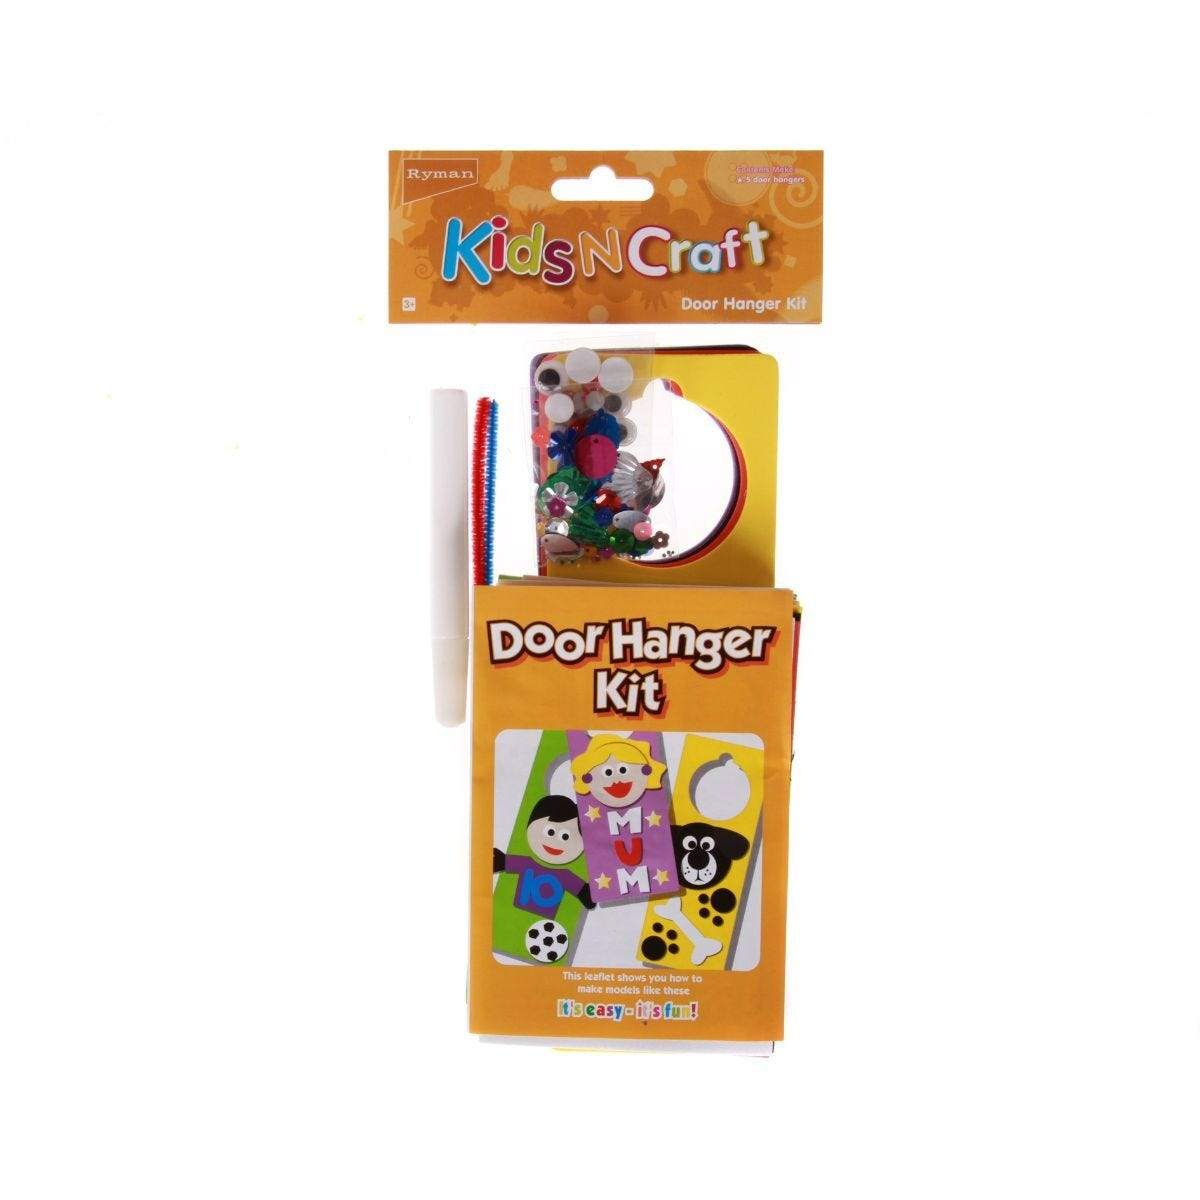 Ryman Kids N Craft Activity Kit Door Hanger Kit